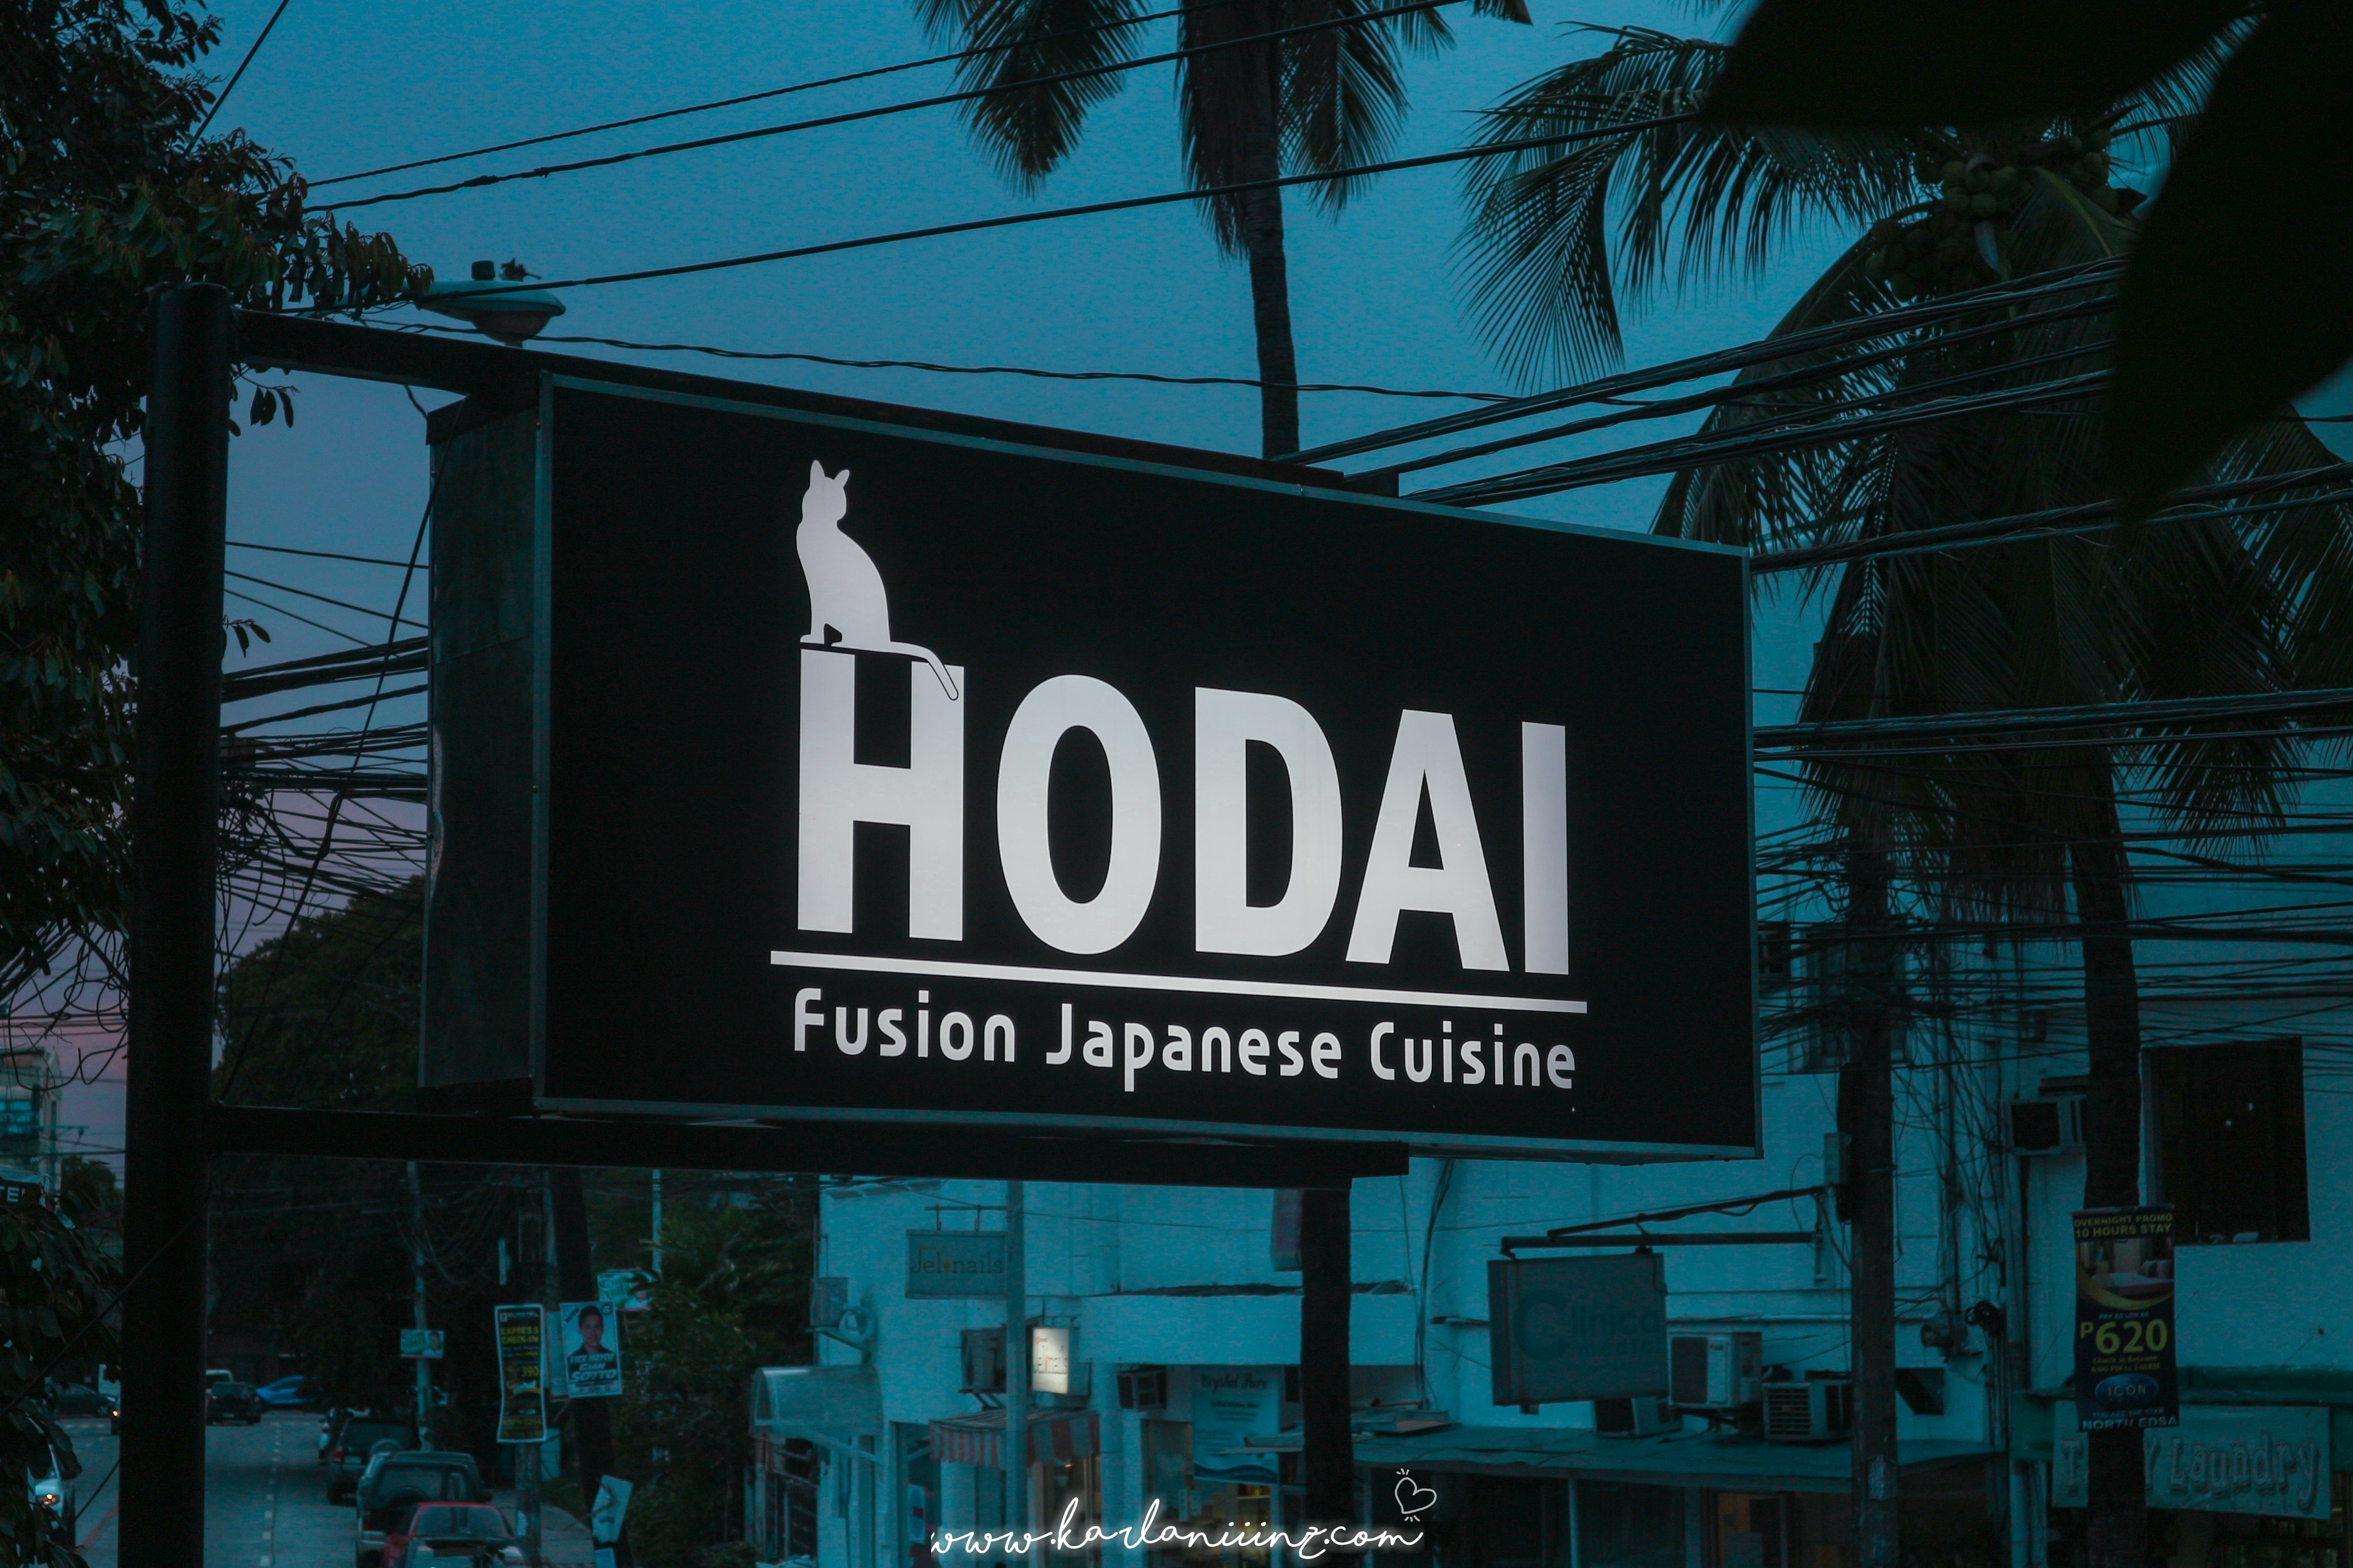 hodai restaurant